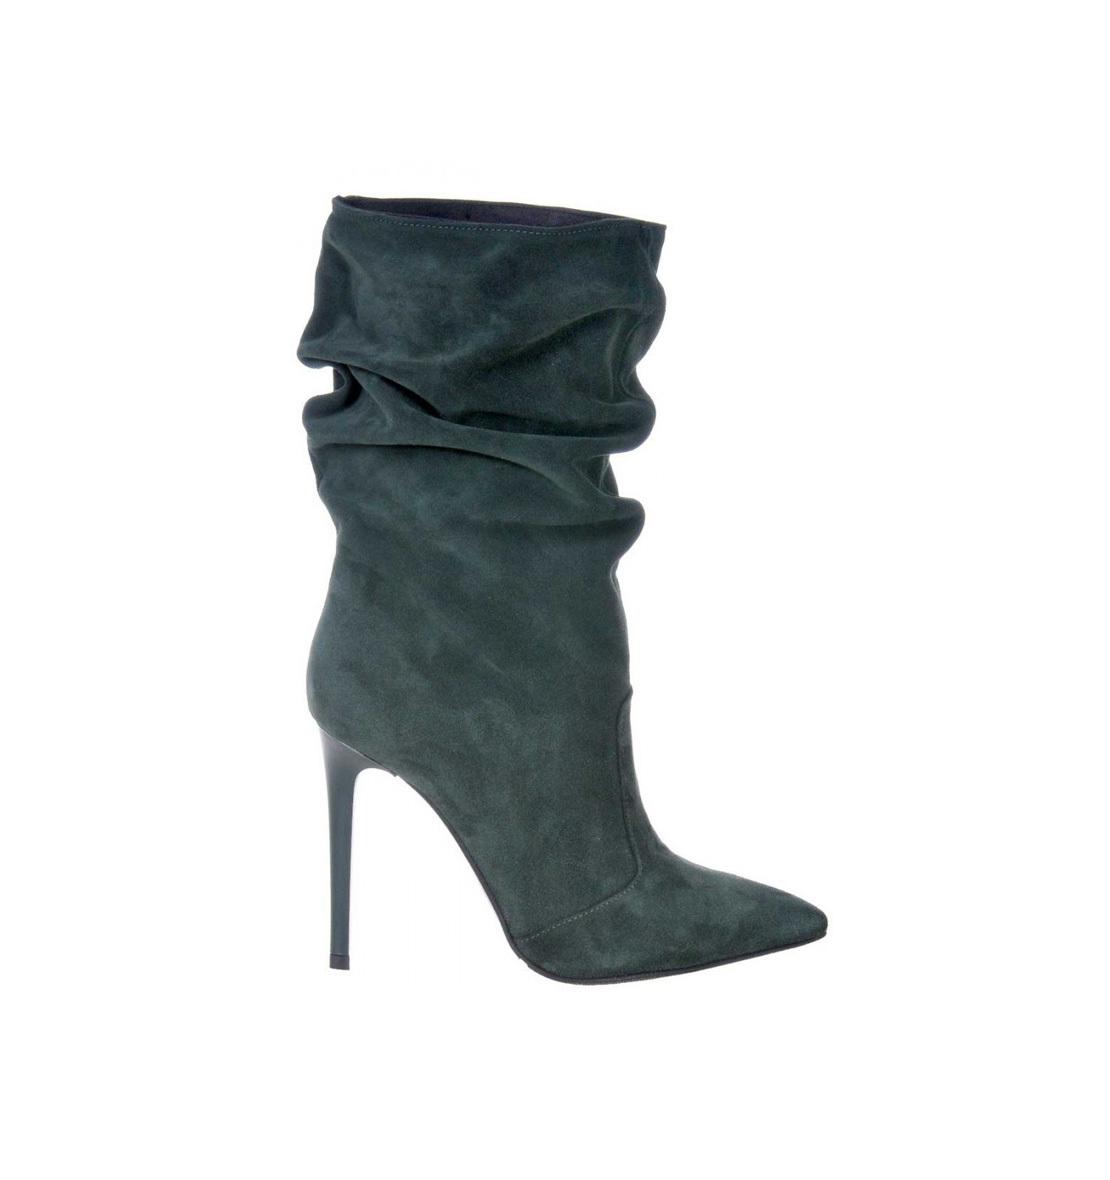 online aici cel mai mic pret magazin din Marea Britanie Botine stiletto verde inchis piele intoarsa